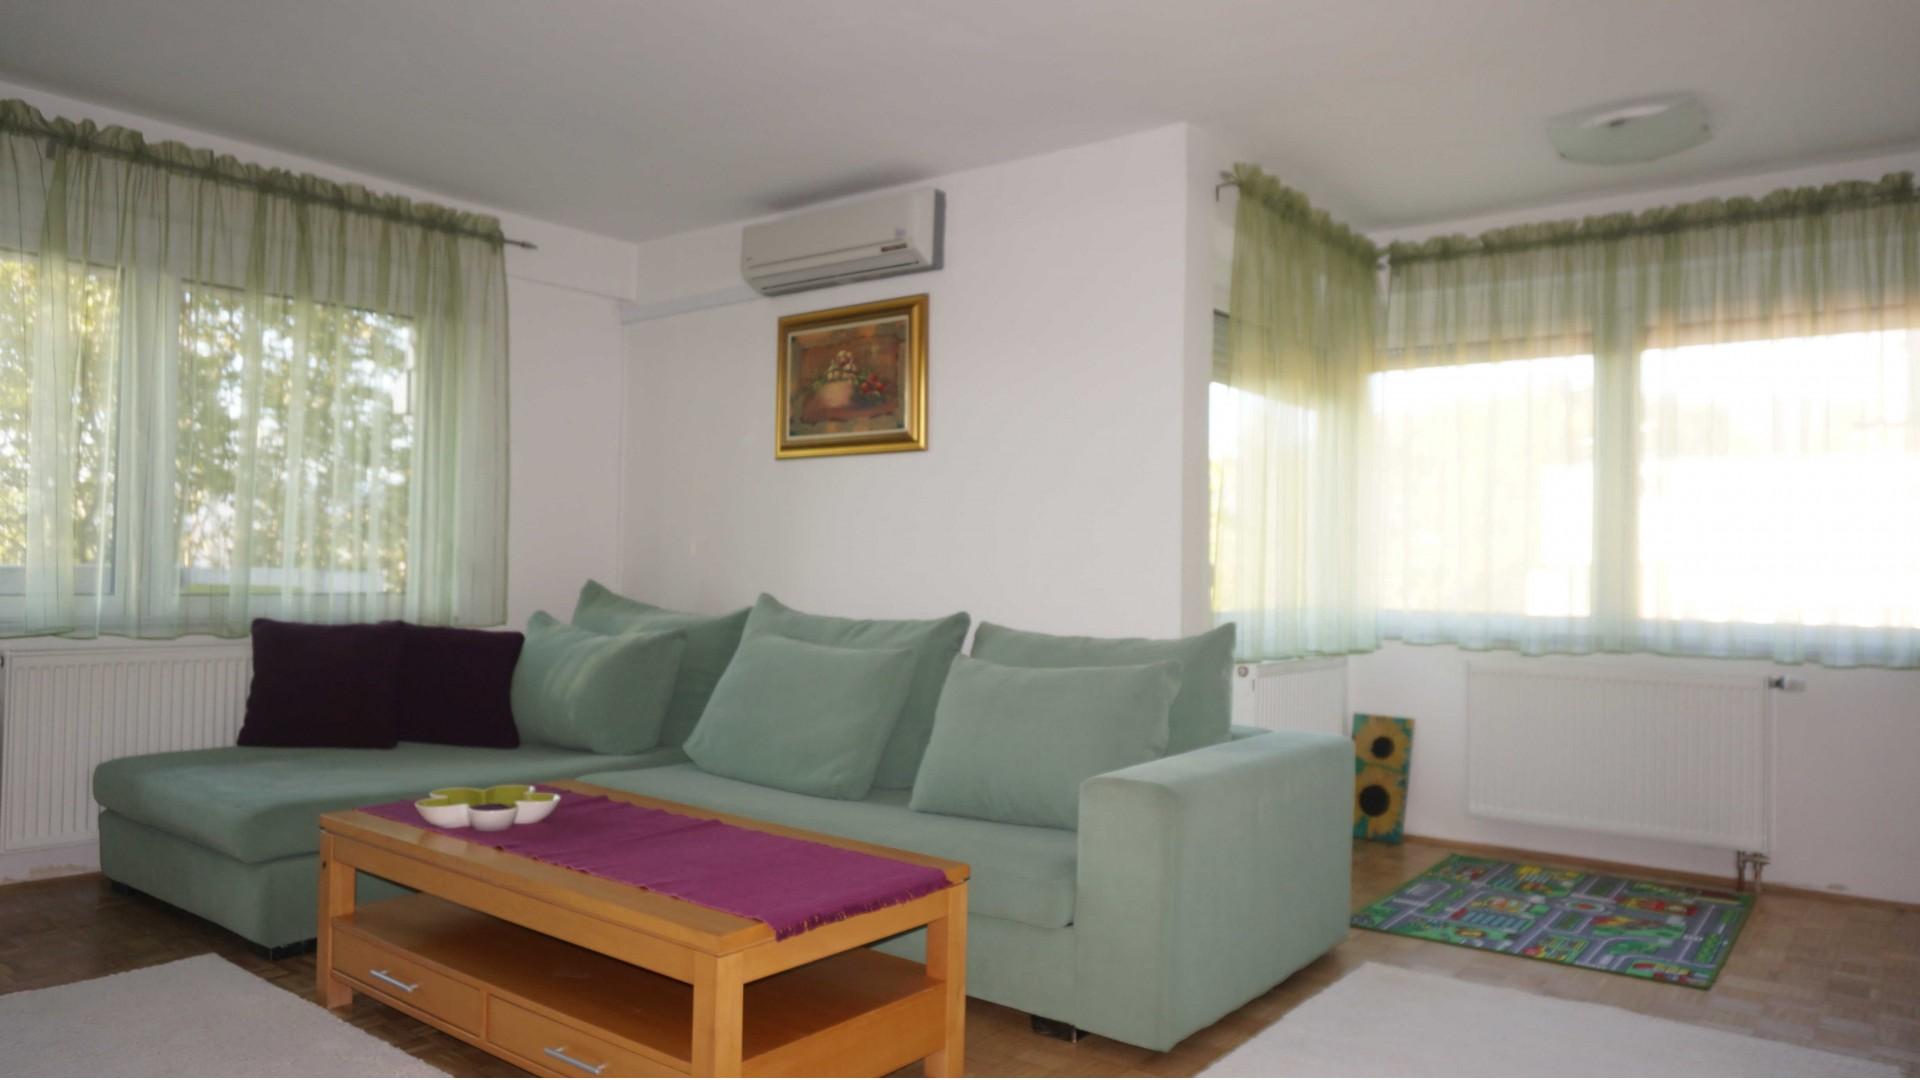 Prostran/renoviran/ dvosoban/ 65 m2